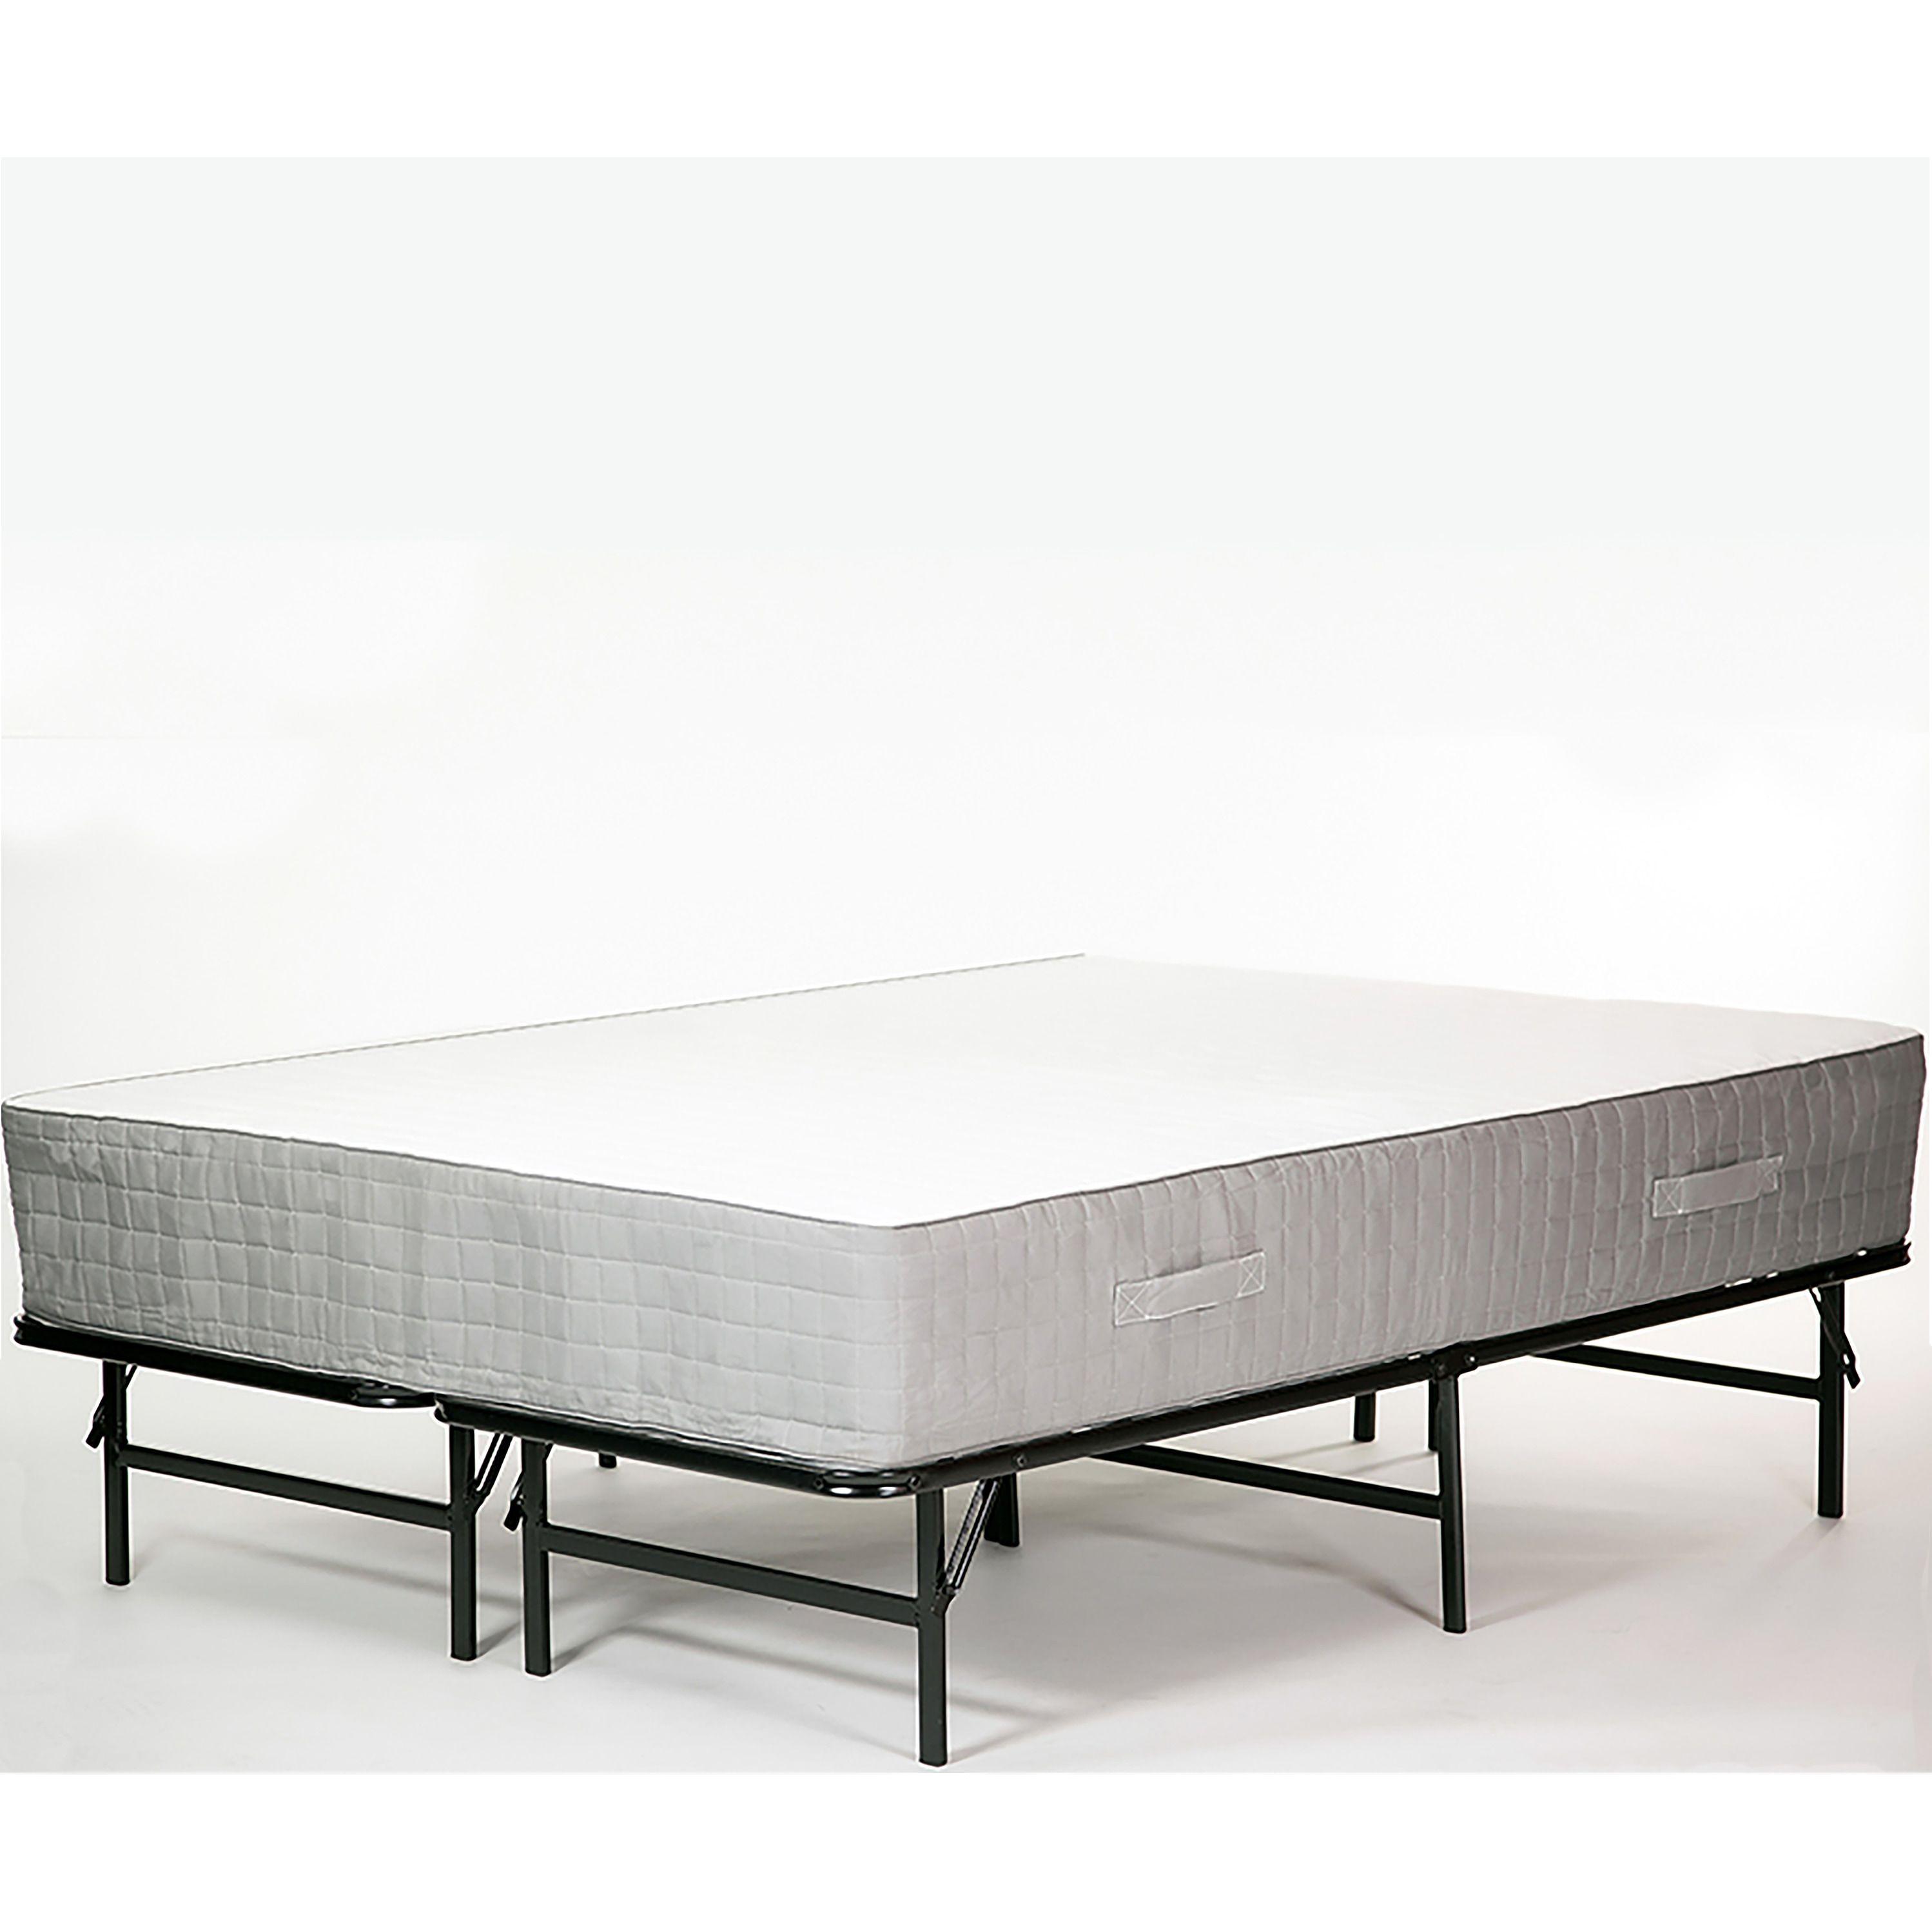 Handy Living California King Foldable Black Metal Bed Frame (Cal